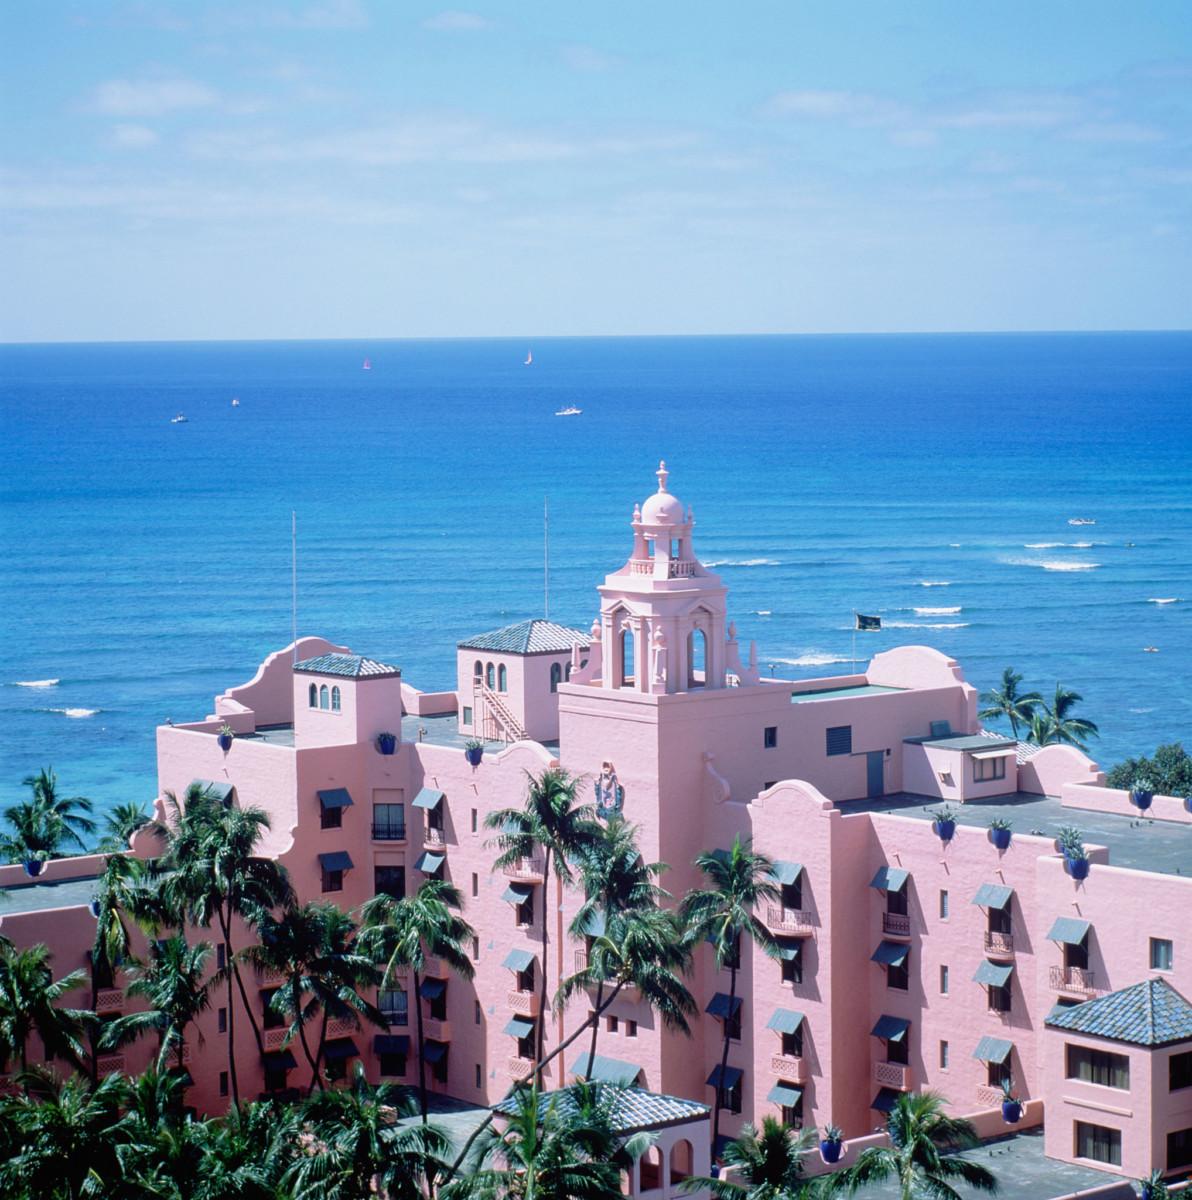 Rosa-hotell-hawaii-5